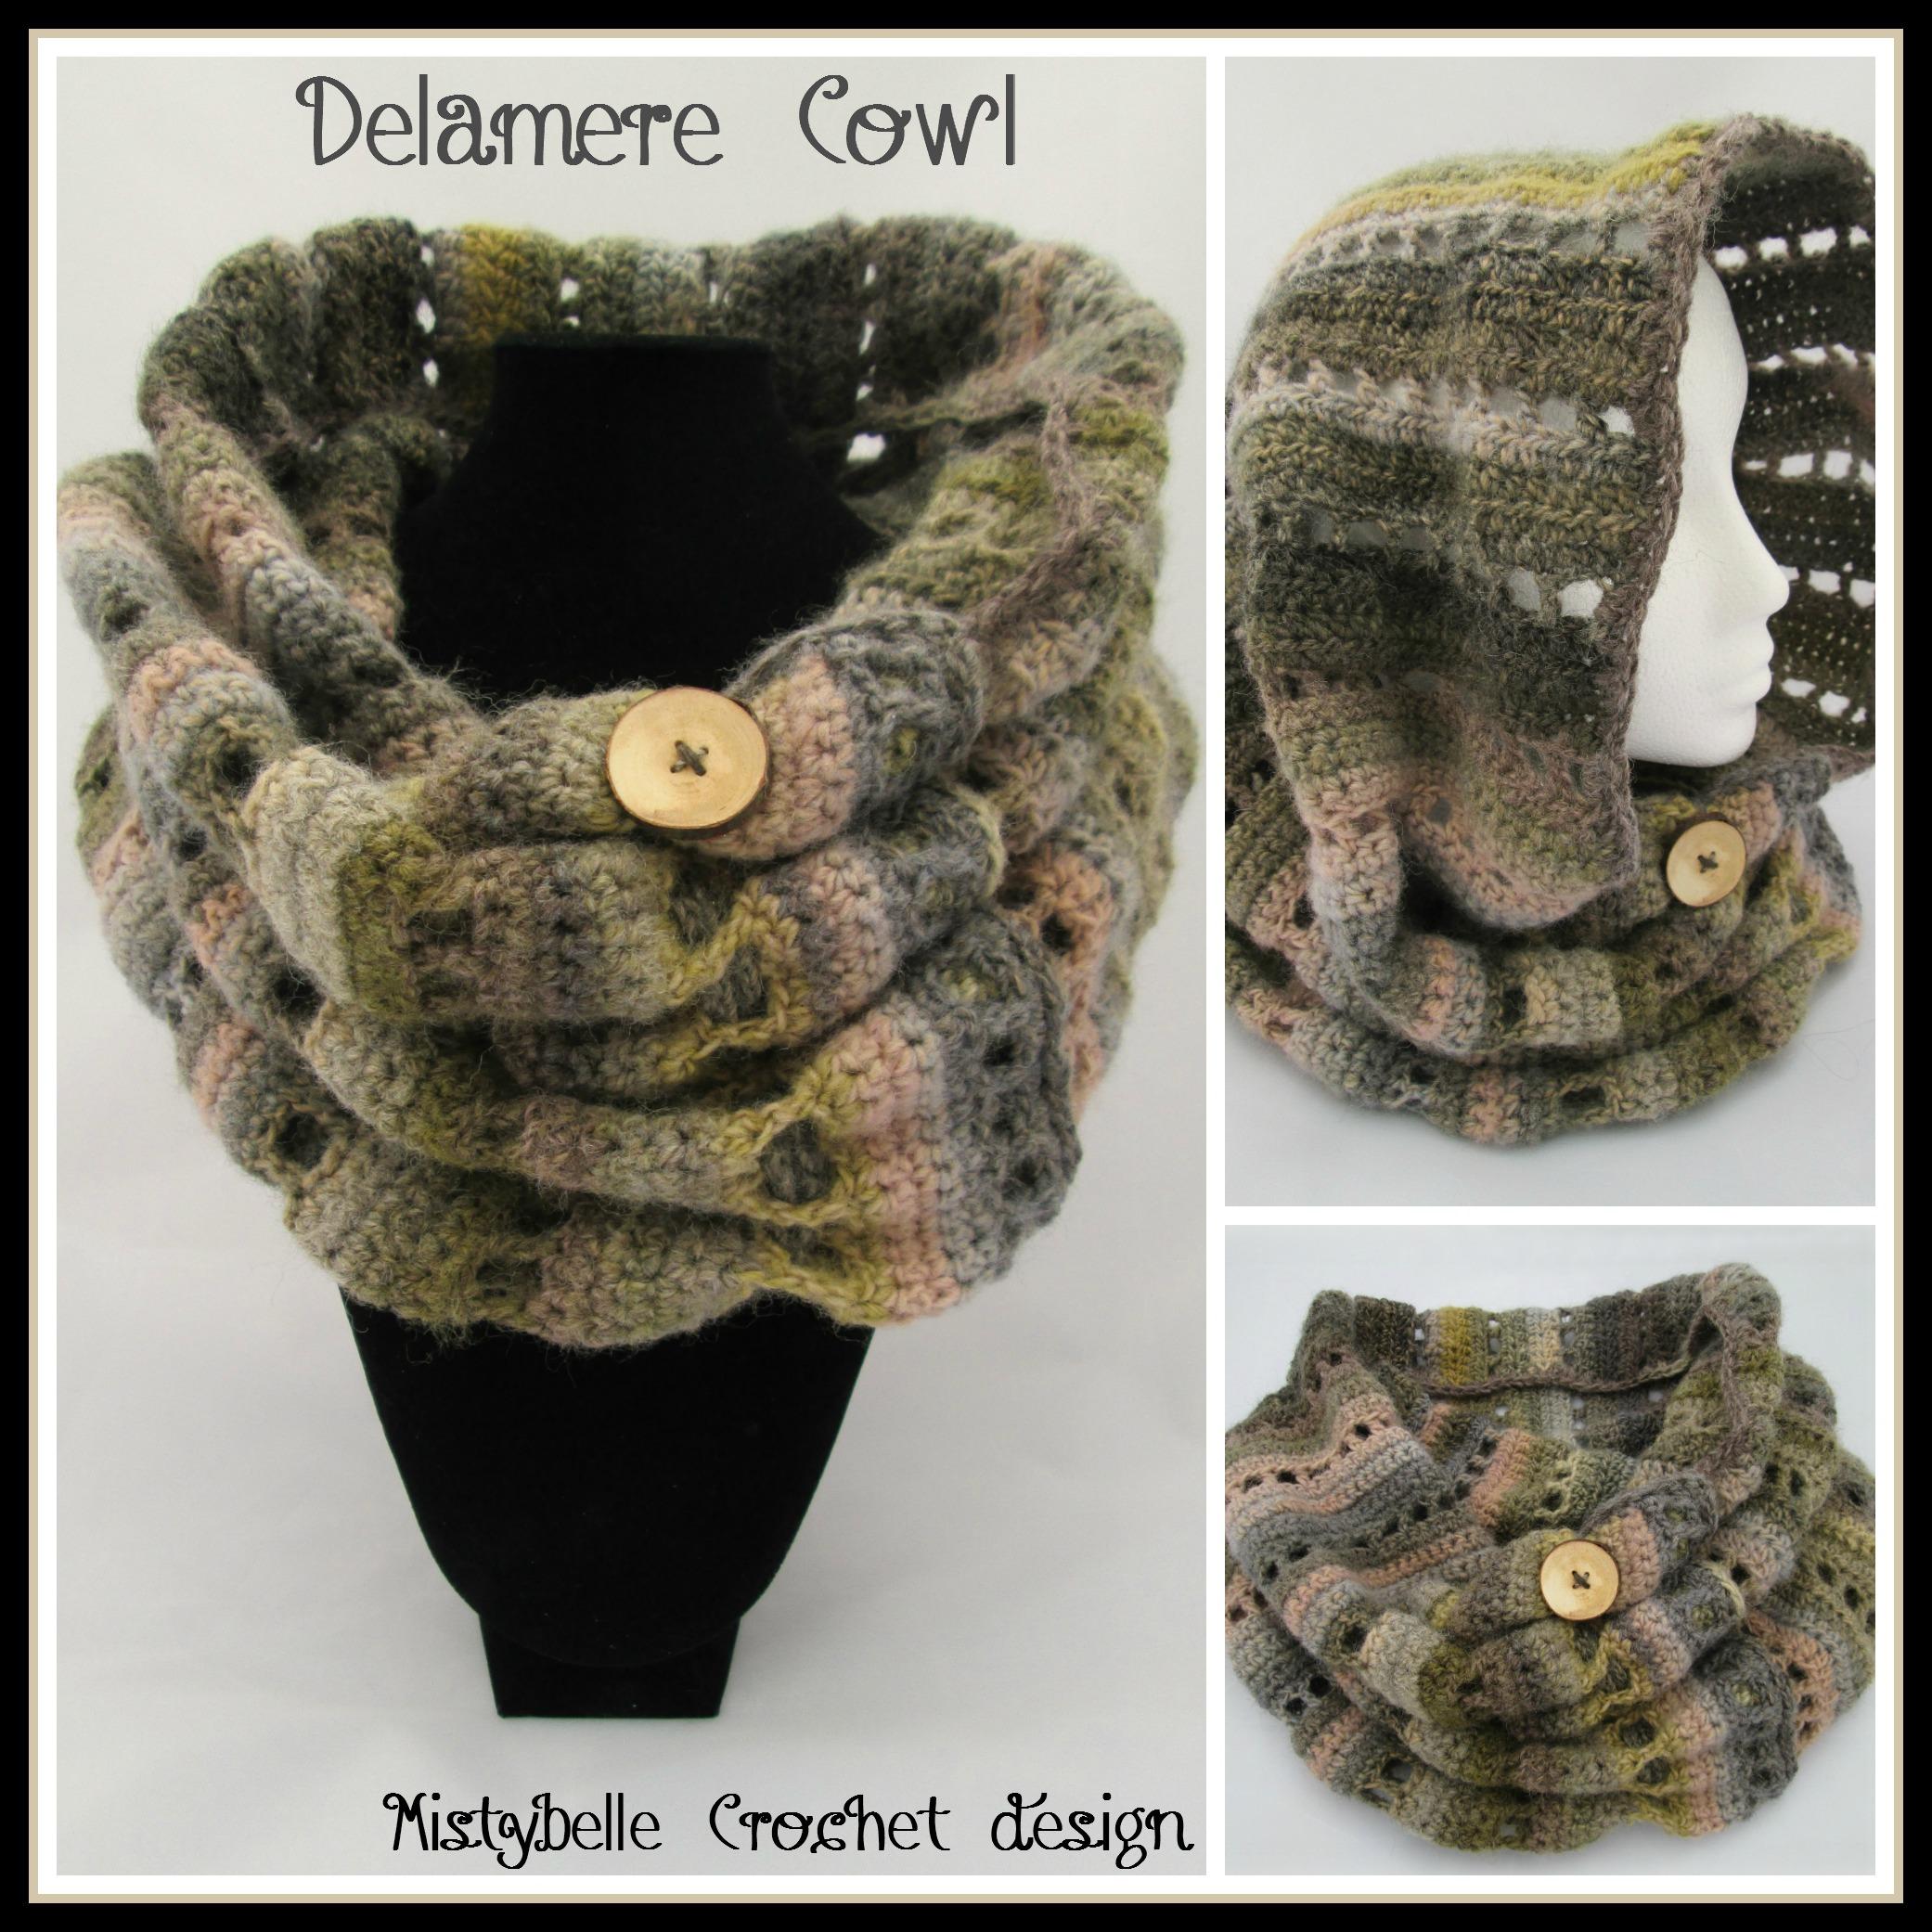 Mistybelle Crochet A Yarn Addiction